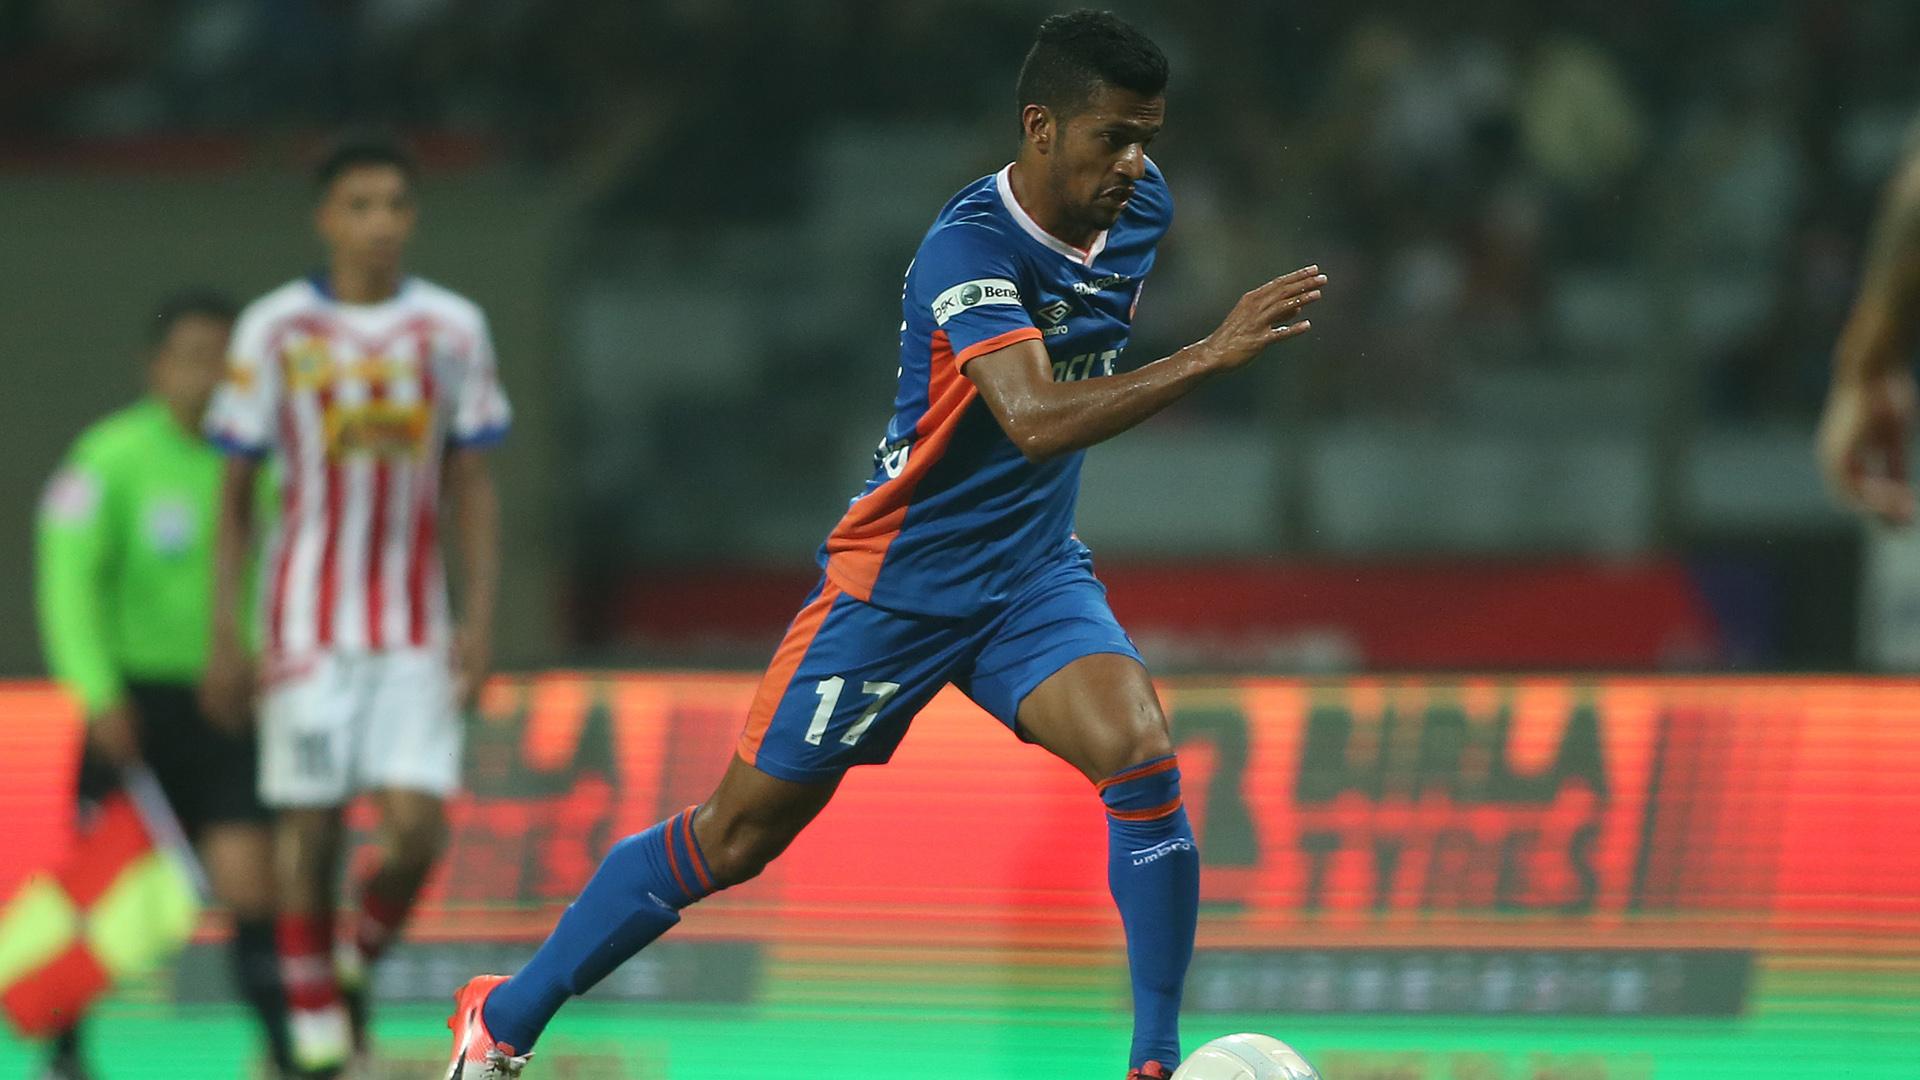 Mandarrao Dessai Atletico de Kolkata FC Goa ISL season 3 2016